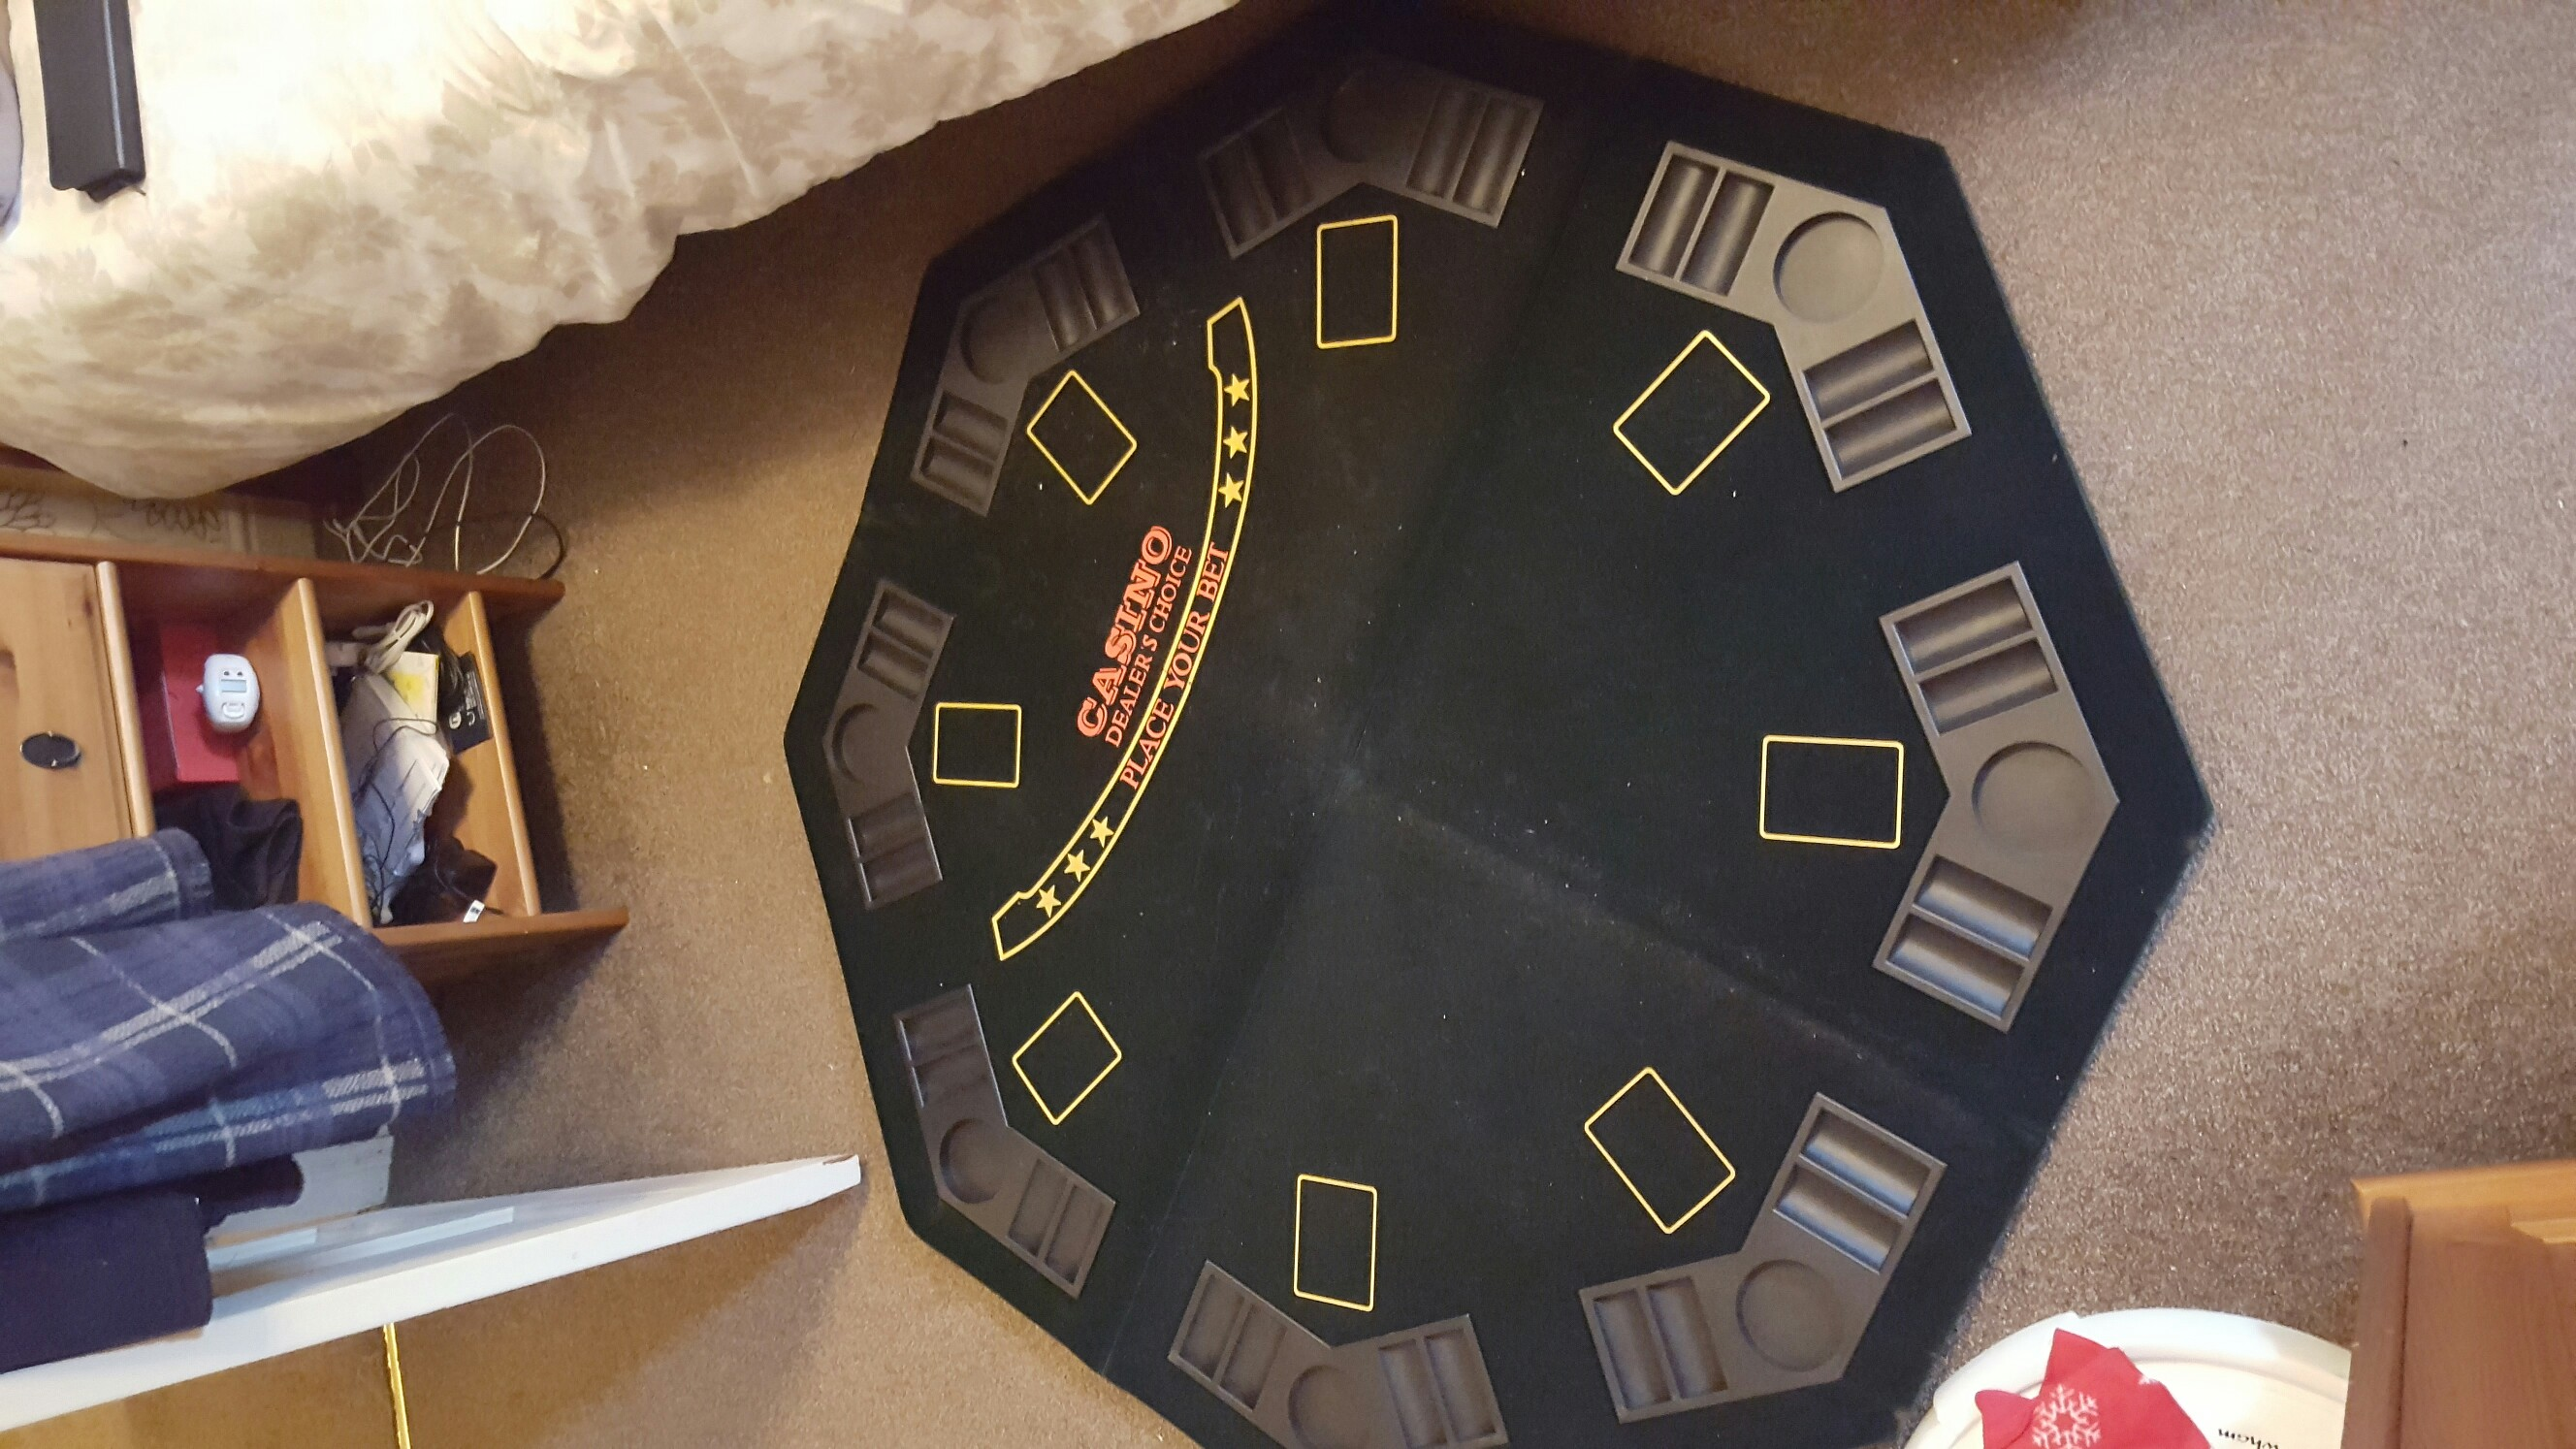 Poker stuff for sale